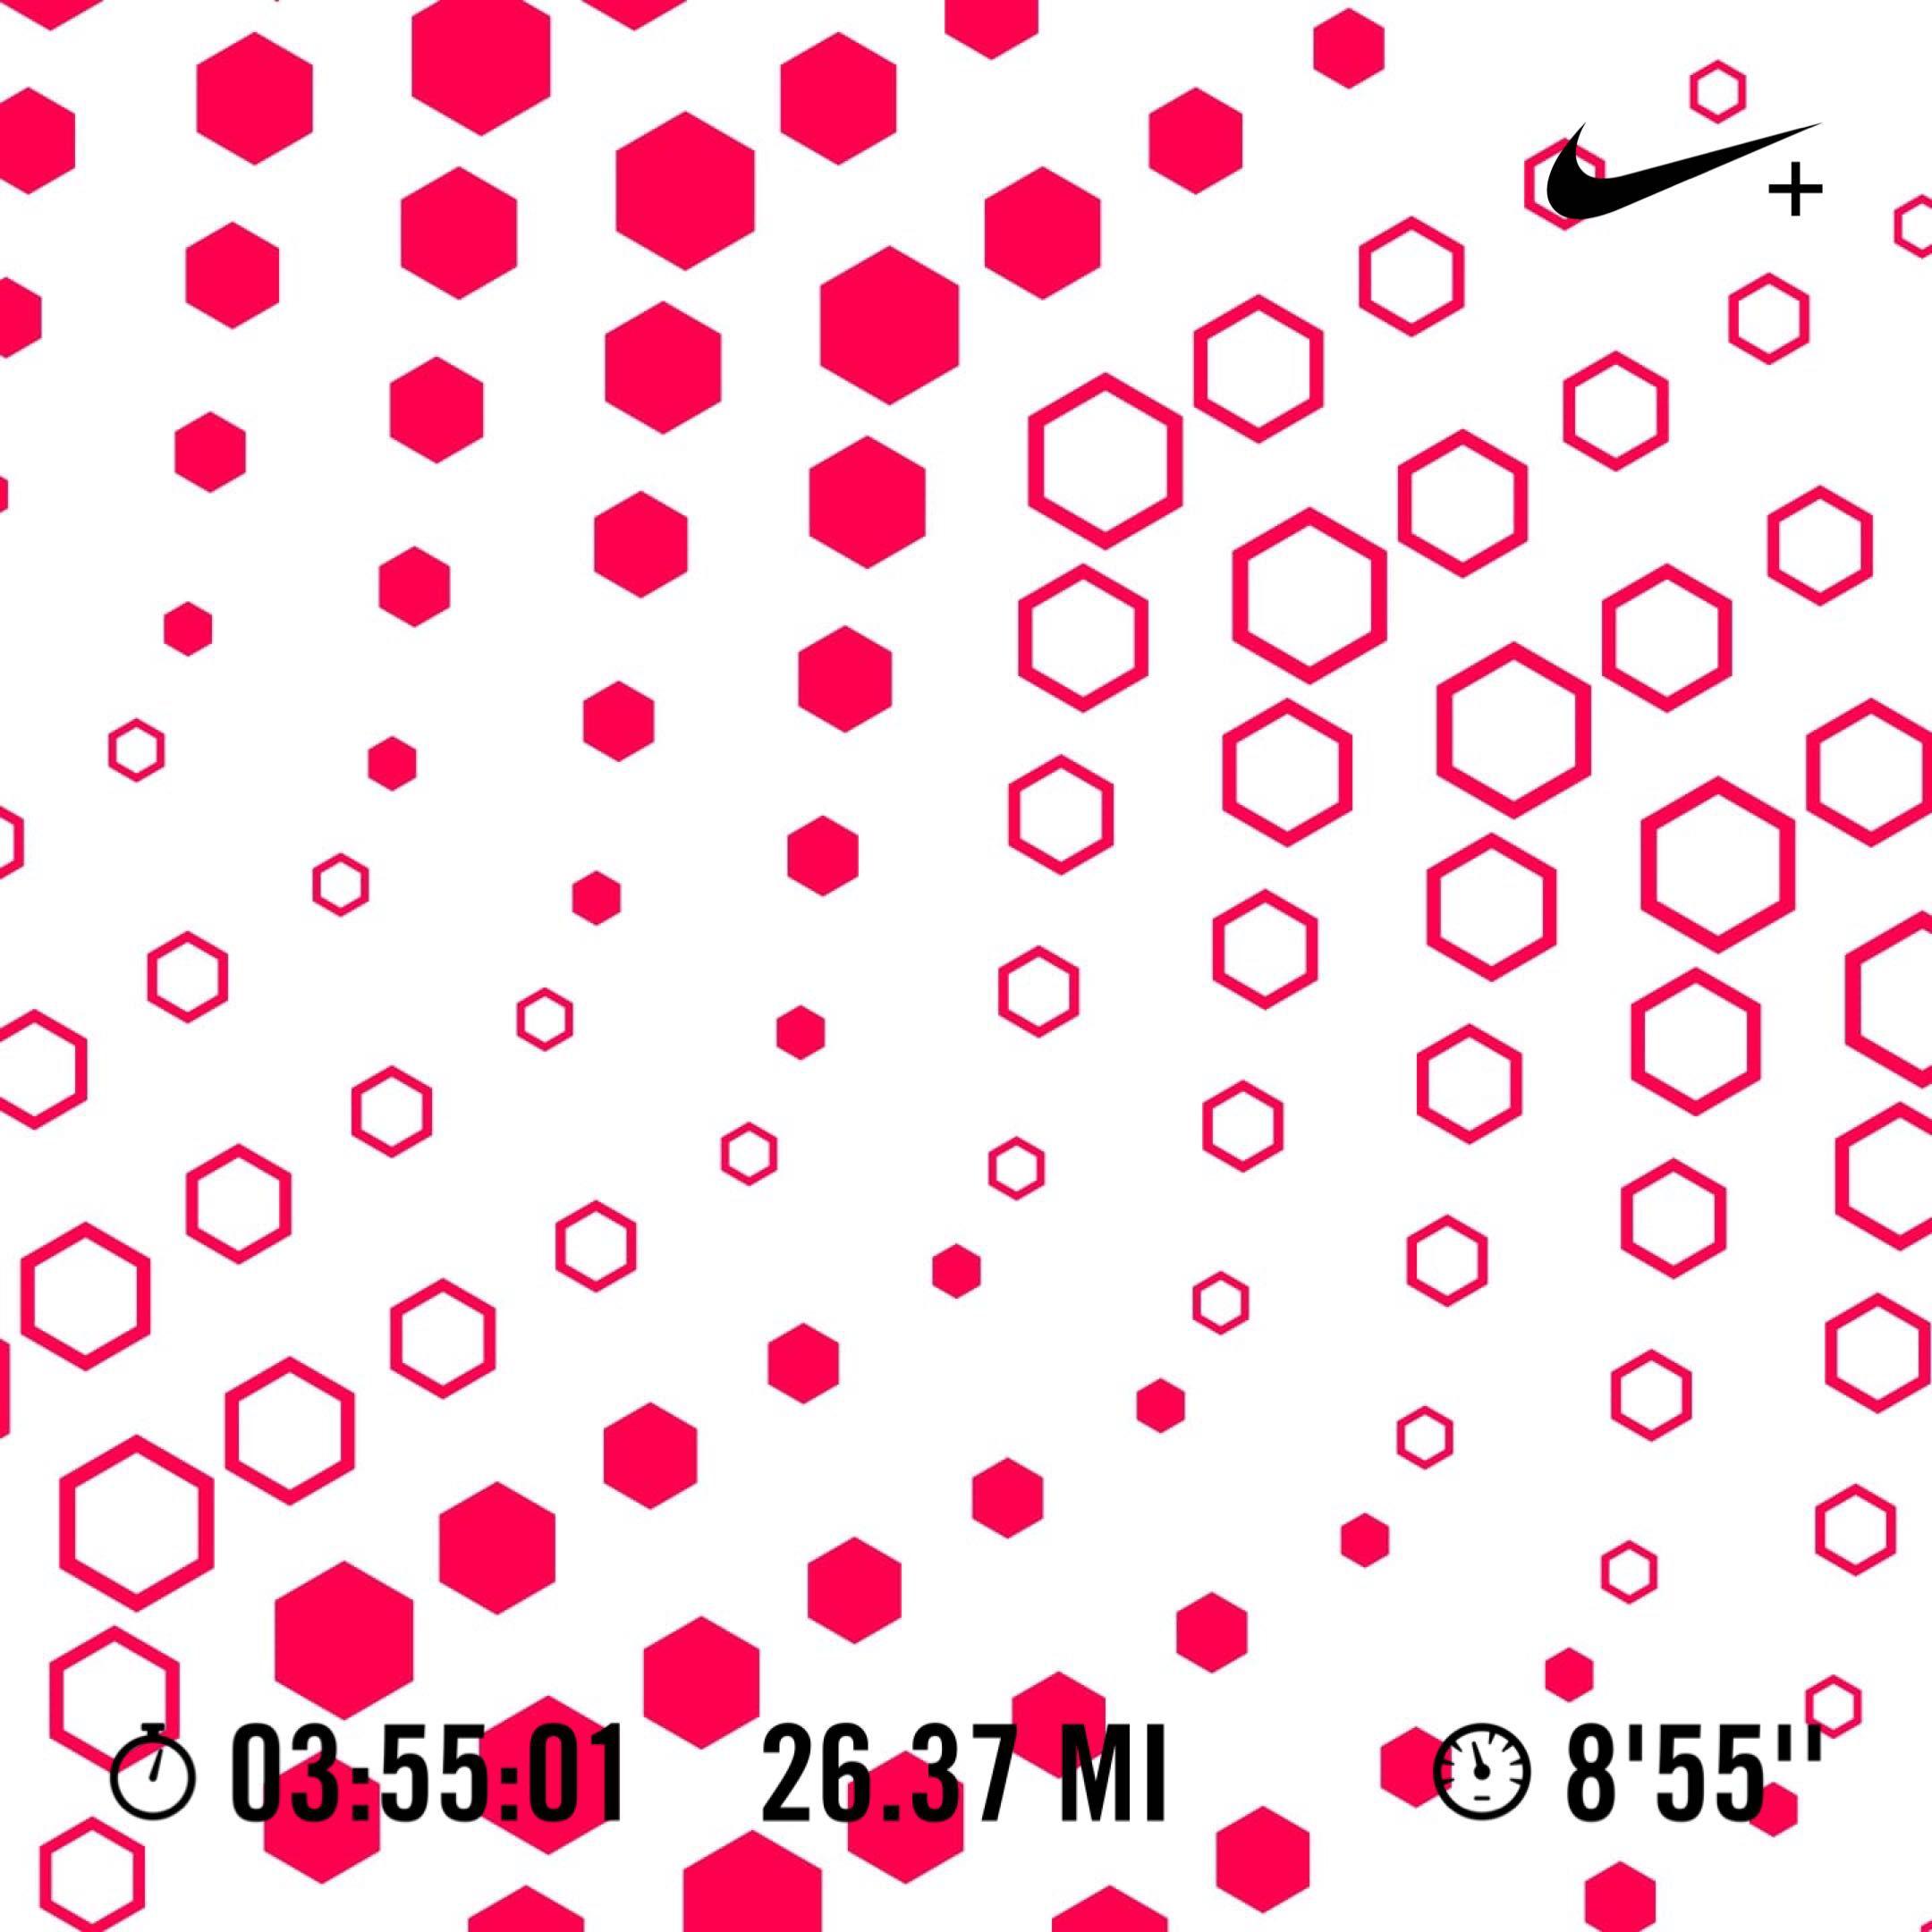 Pin by SUNN on Marathon goals Running club, Past my